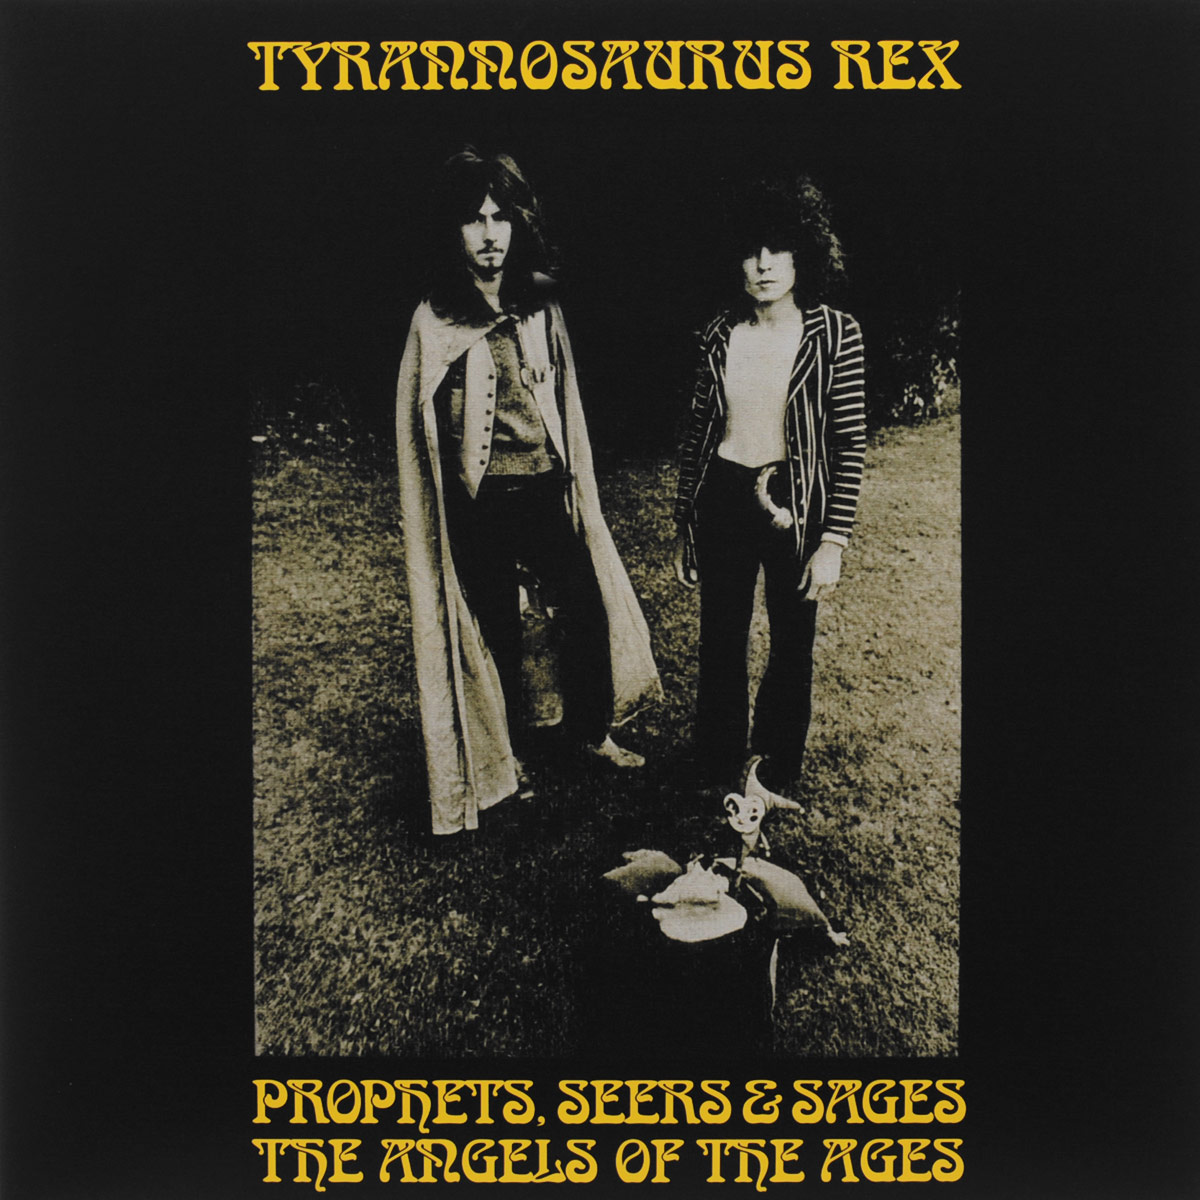 Tyrannosaurus Rex Tyrannosaurus Rex. Prophets, Seers & Sages. The Angels Of The Ages (2 LP) защитная пленка lp универсальная 2 8 матовая